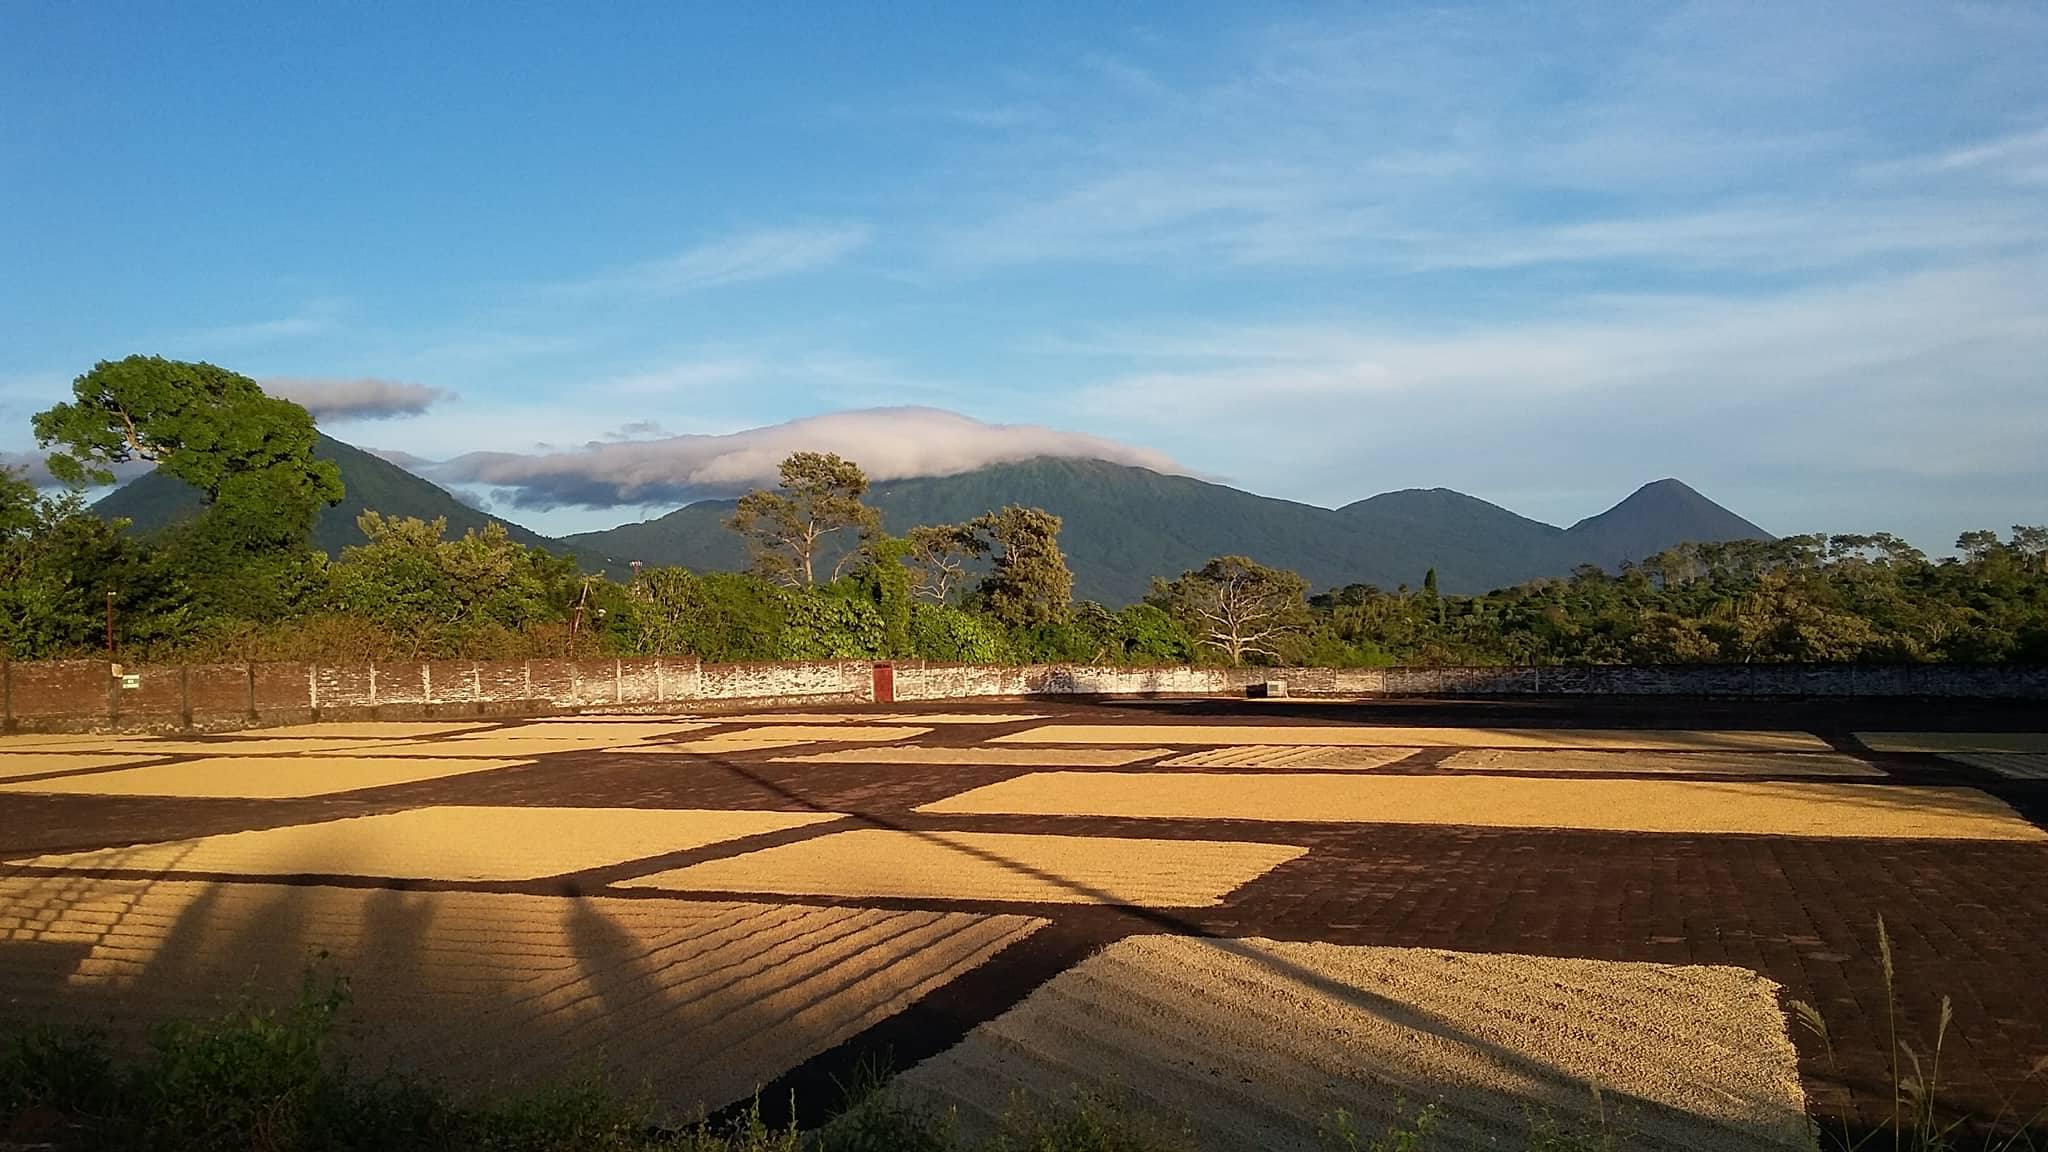 drying patios coffee mill